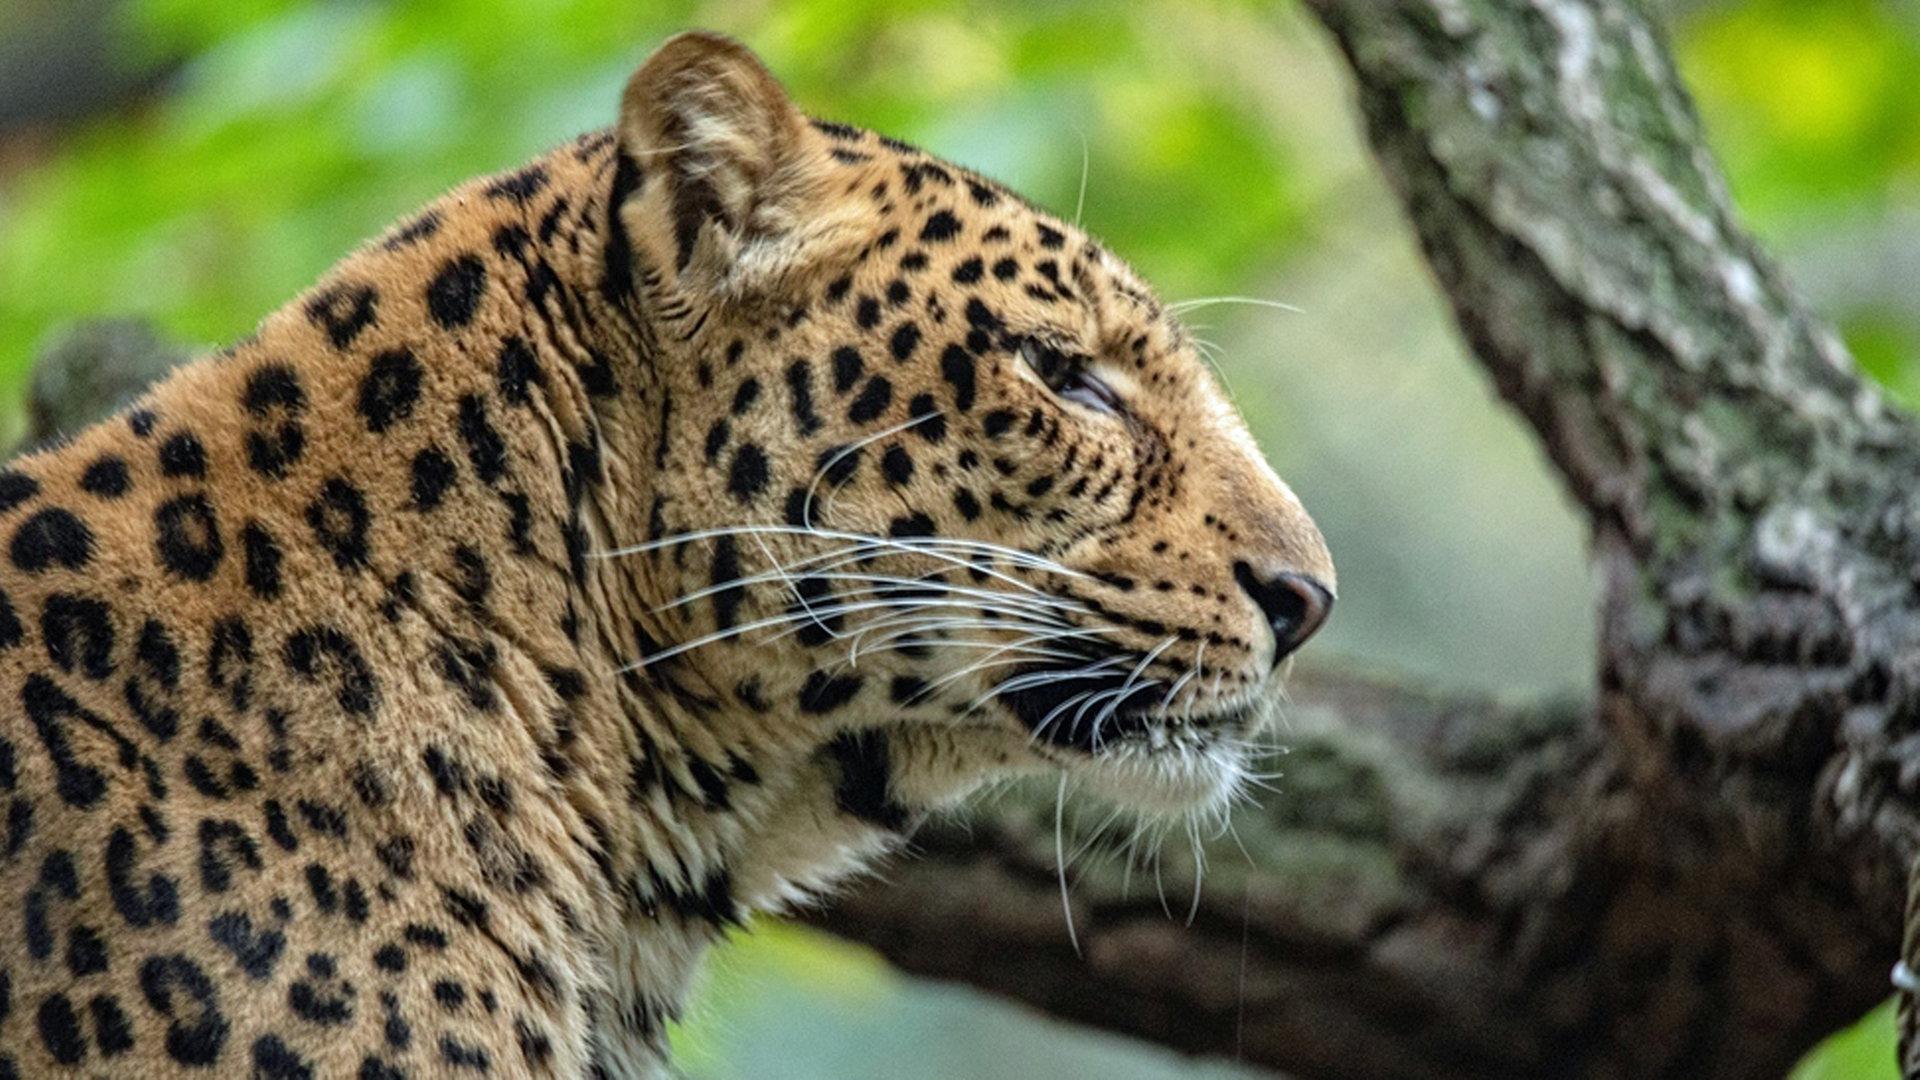 Tierpark Hagenbeck Seltene Leoparden aus Südkorea   NDR.de ...